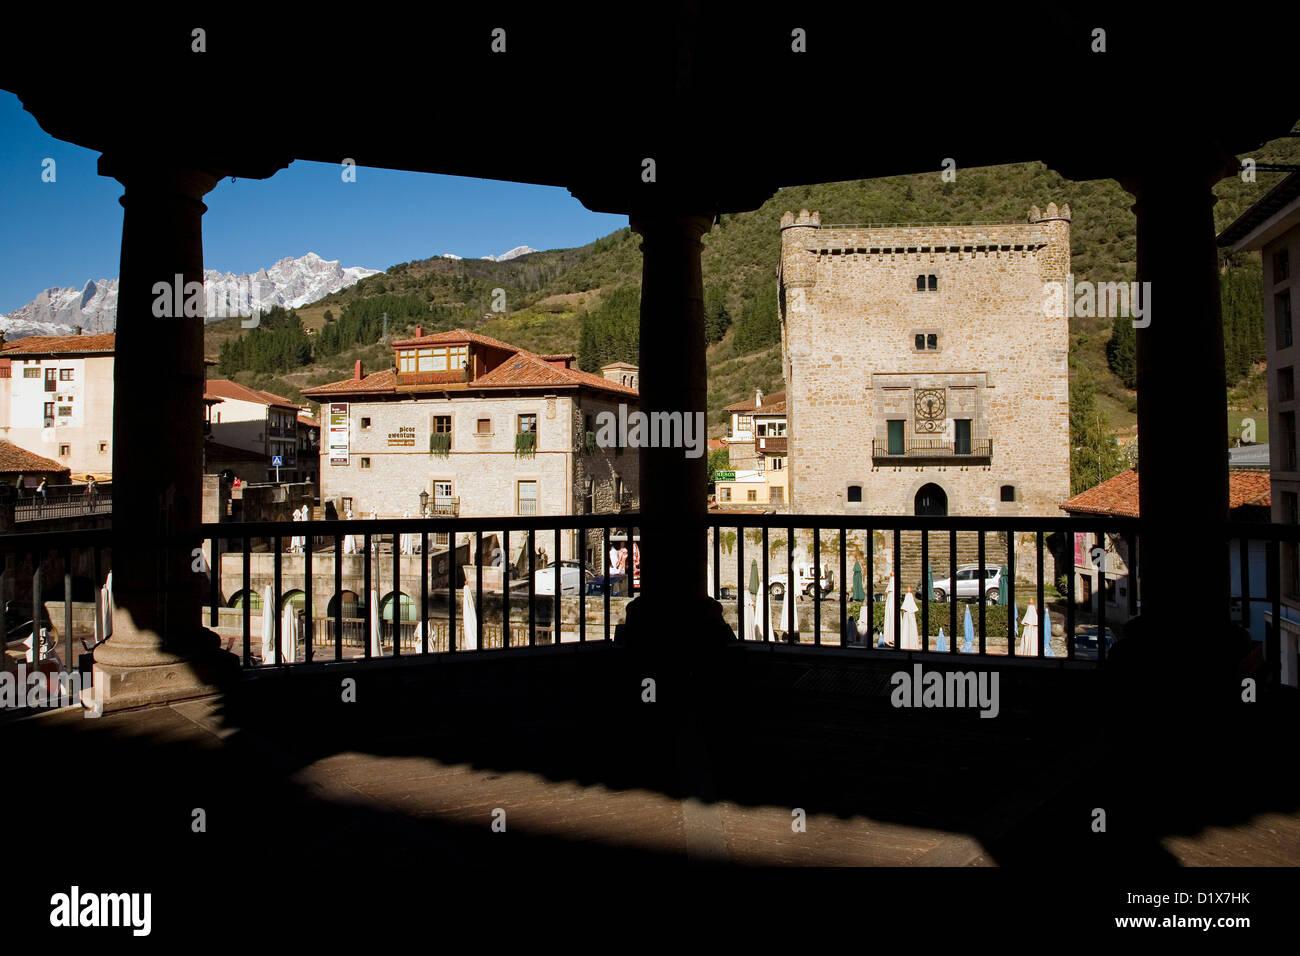 Potes Torre del Infantado Liébana Picos de Europa Cantabria Spain - Stock Image